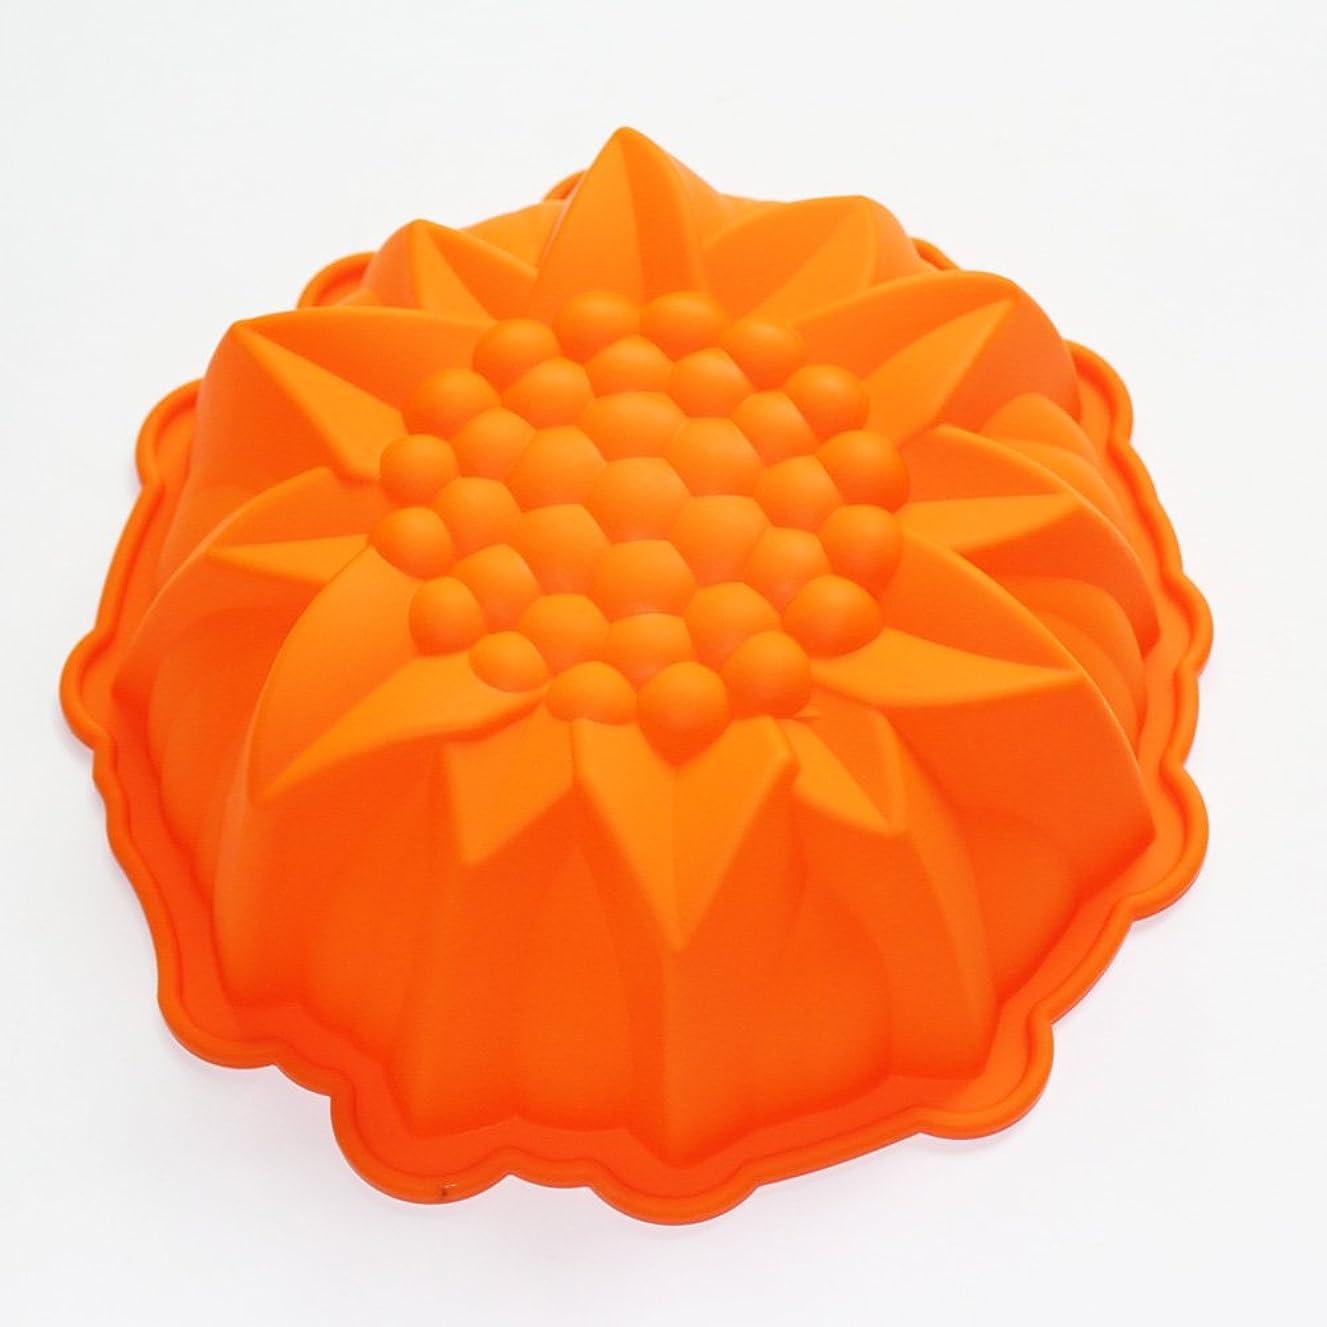 X-Haibei 9inch Round Flower Cake Baking Silicone Mold Cake Decorating Dessert Pan